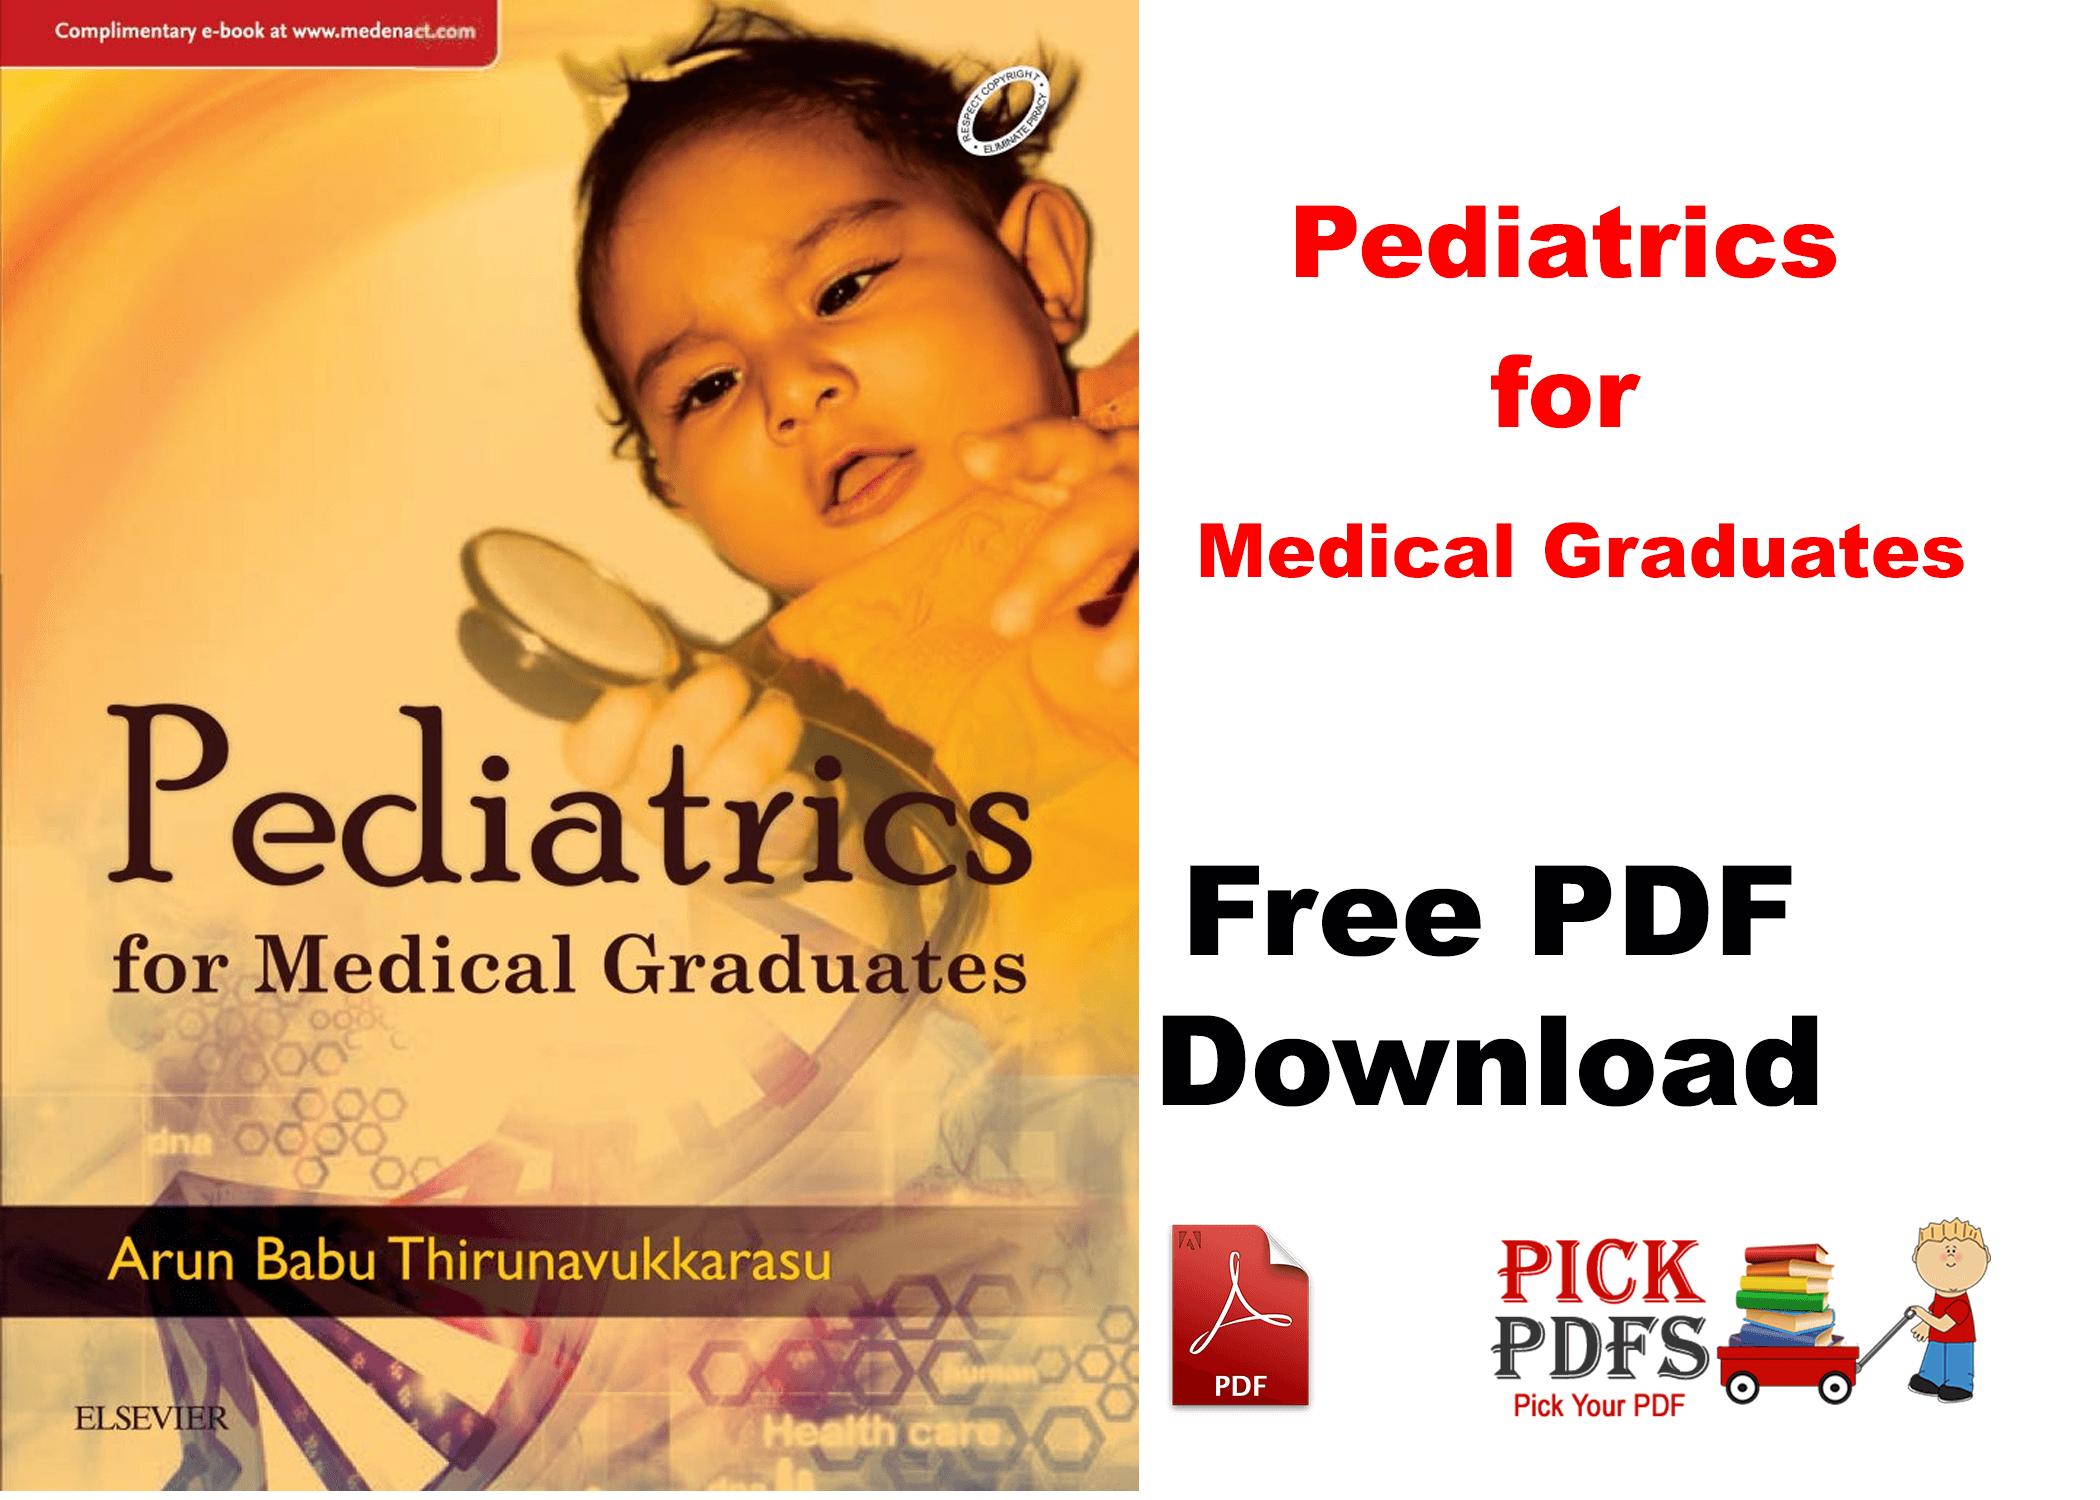 https://pickpdfs.com/pediatrics-for-medical-graduates-pdf-free-download-direct-link/